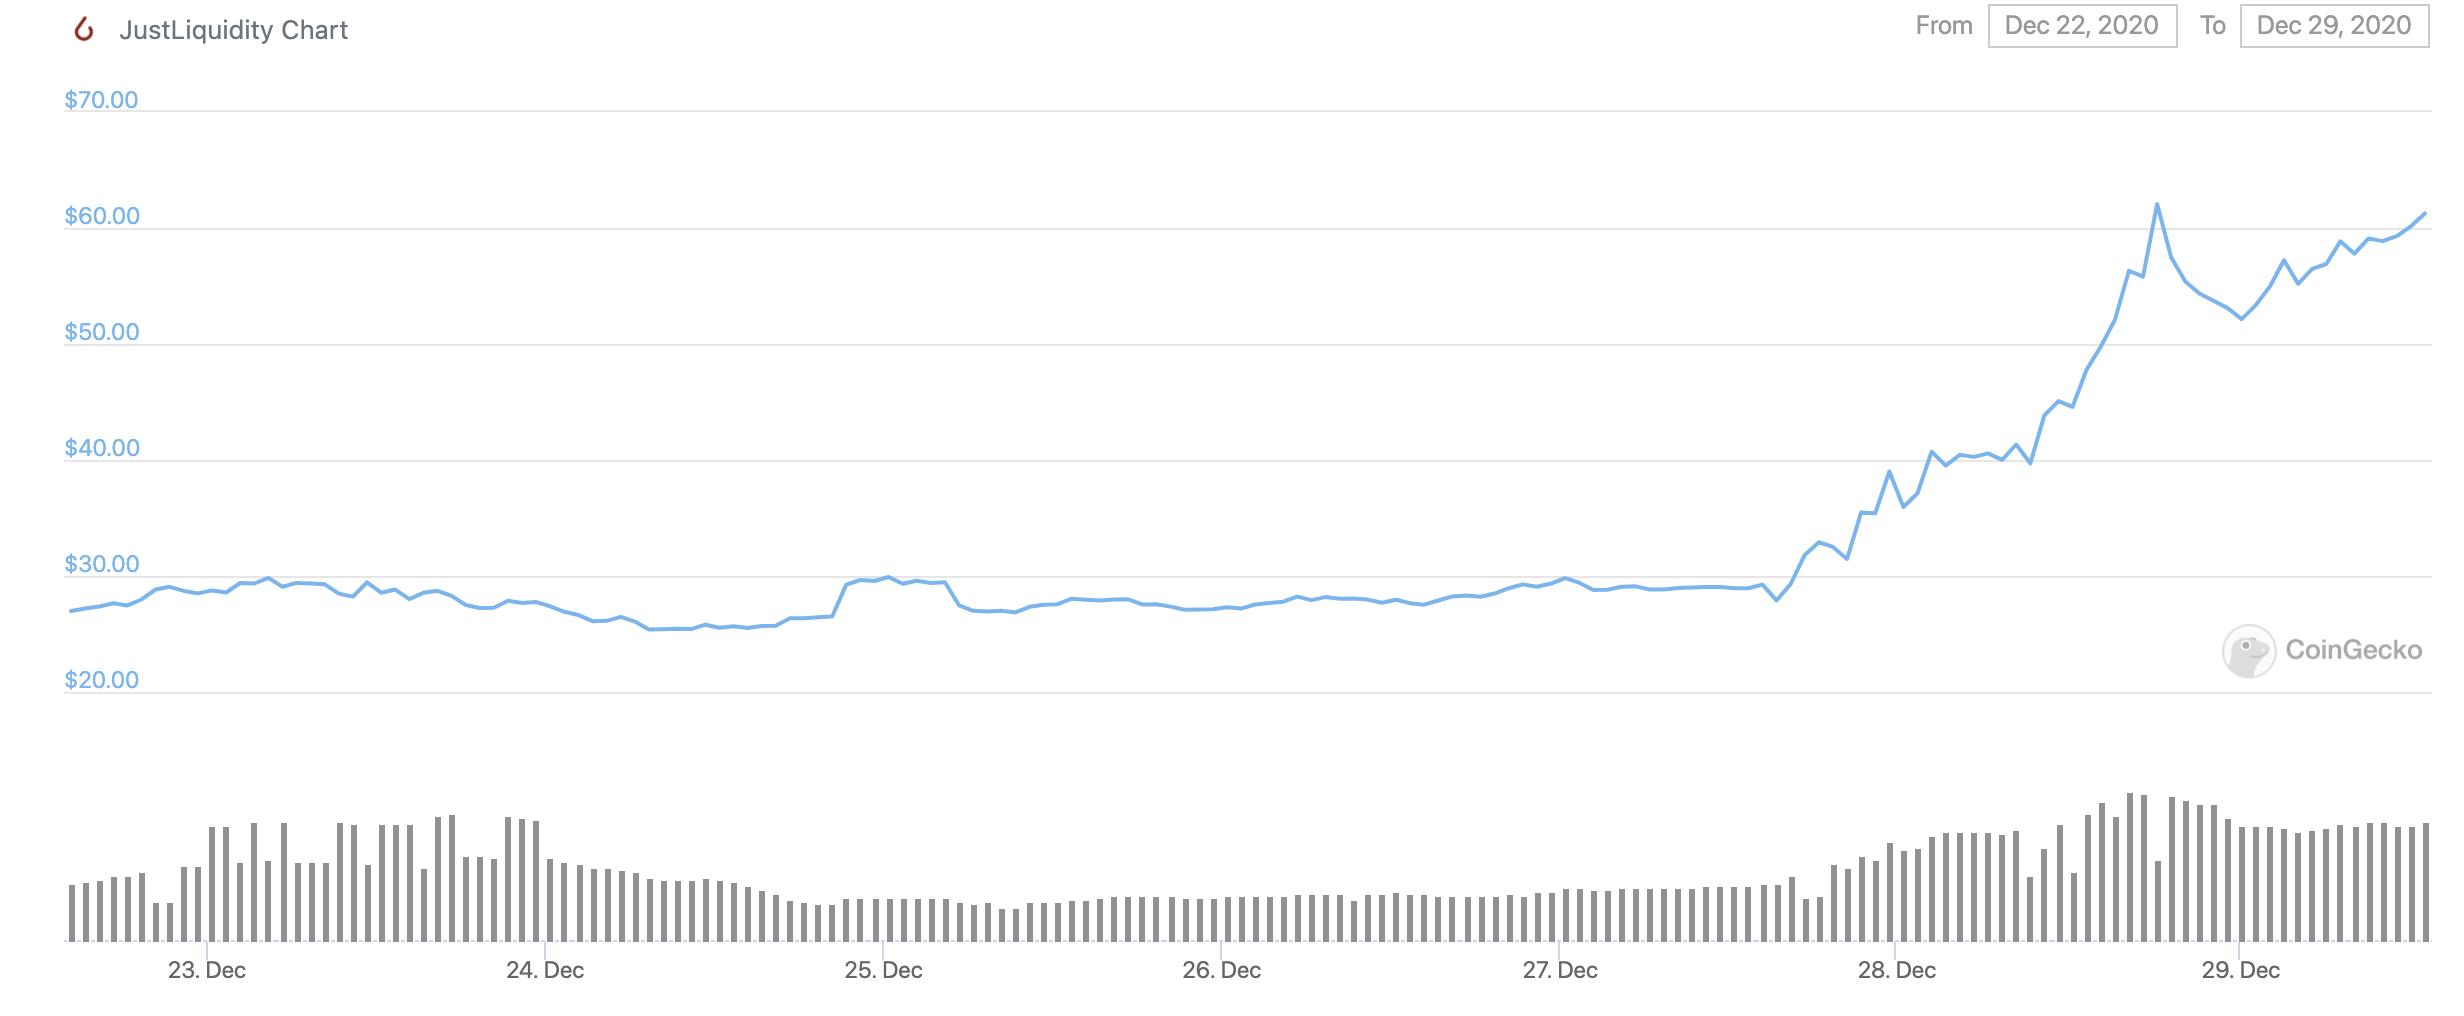 justliquidity-coin-token-kripto-para-fiyat-dolar-usd-coingecko